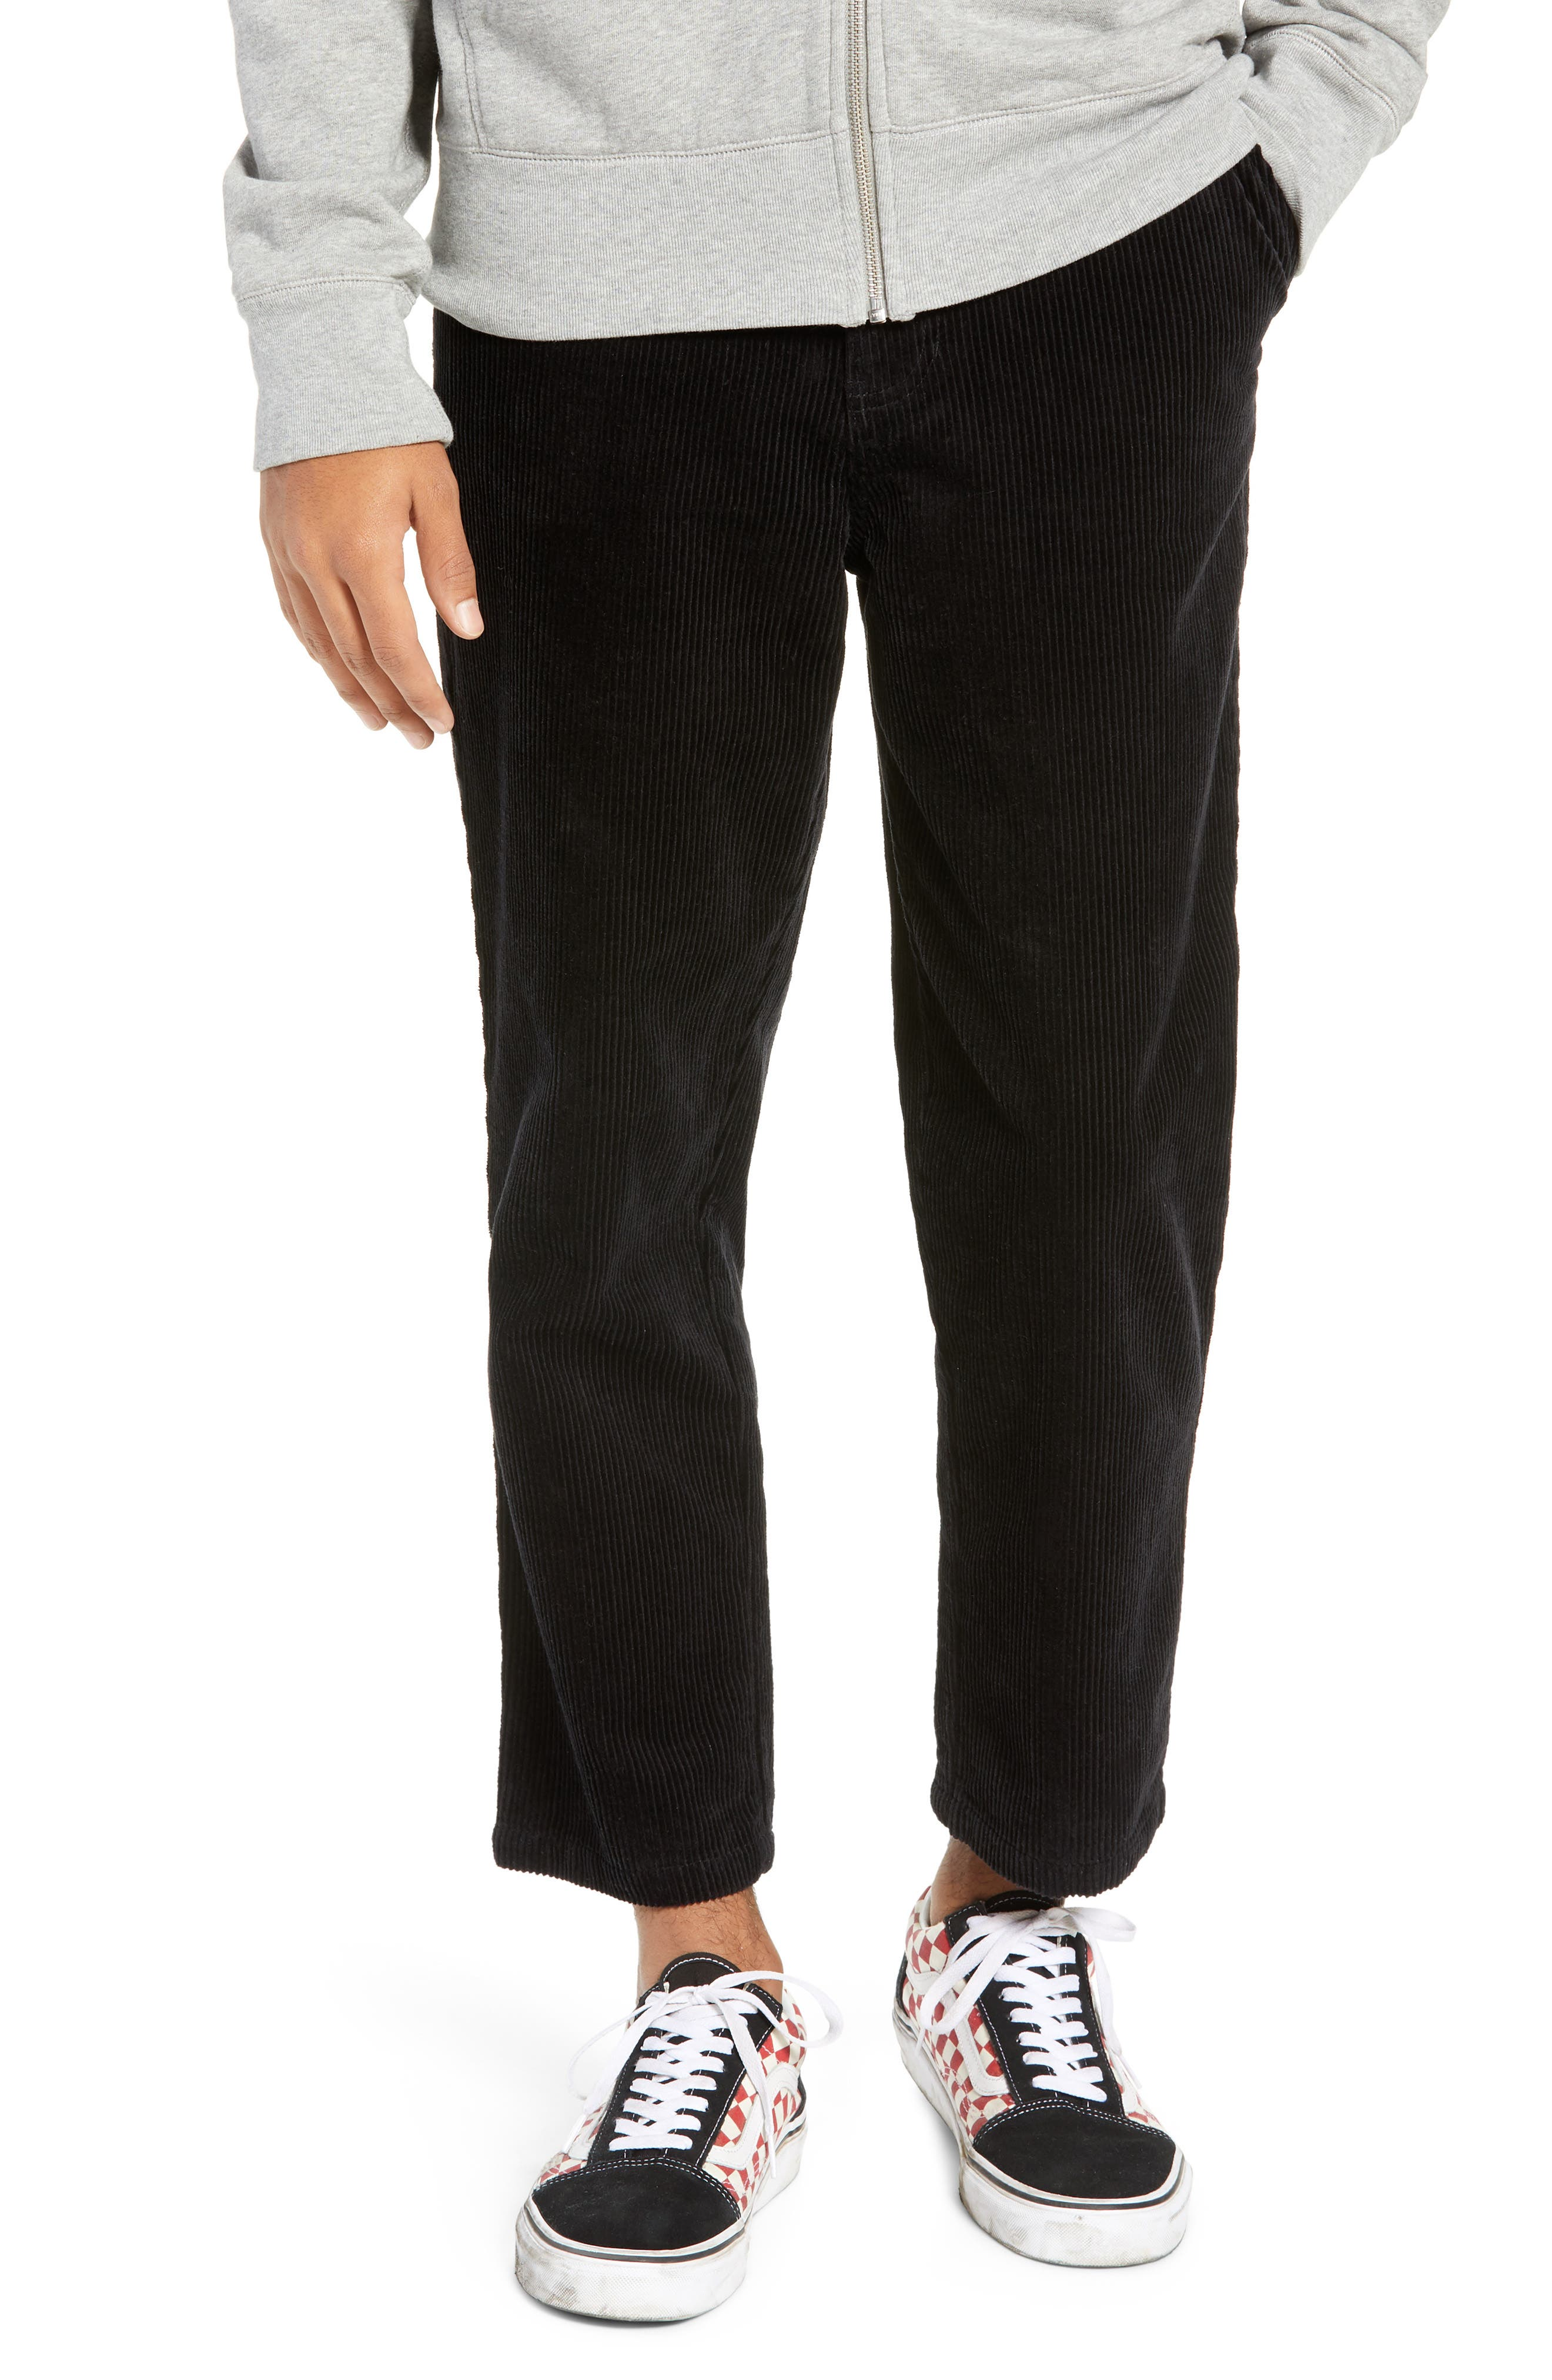 Iggy Wide Wale Cotton Corduroy Straight Leg Pants,                             Main thumbnail 1, color,                             BLACK